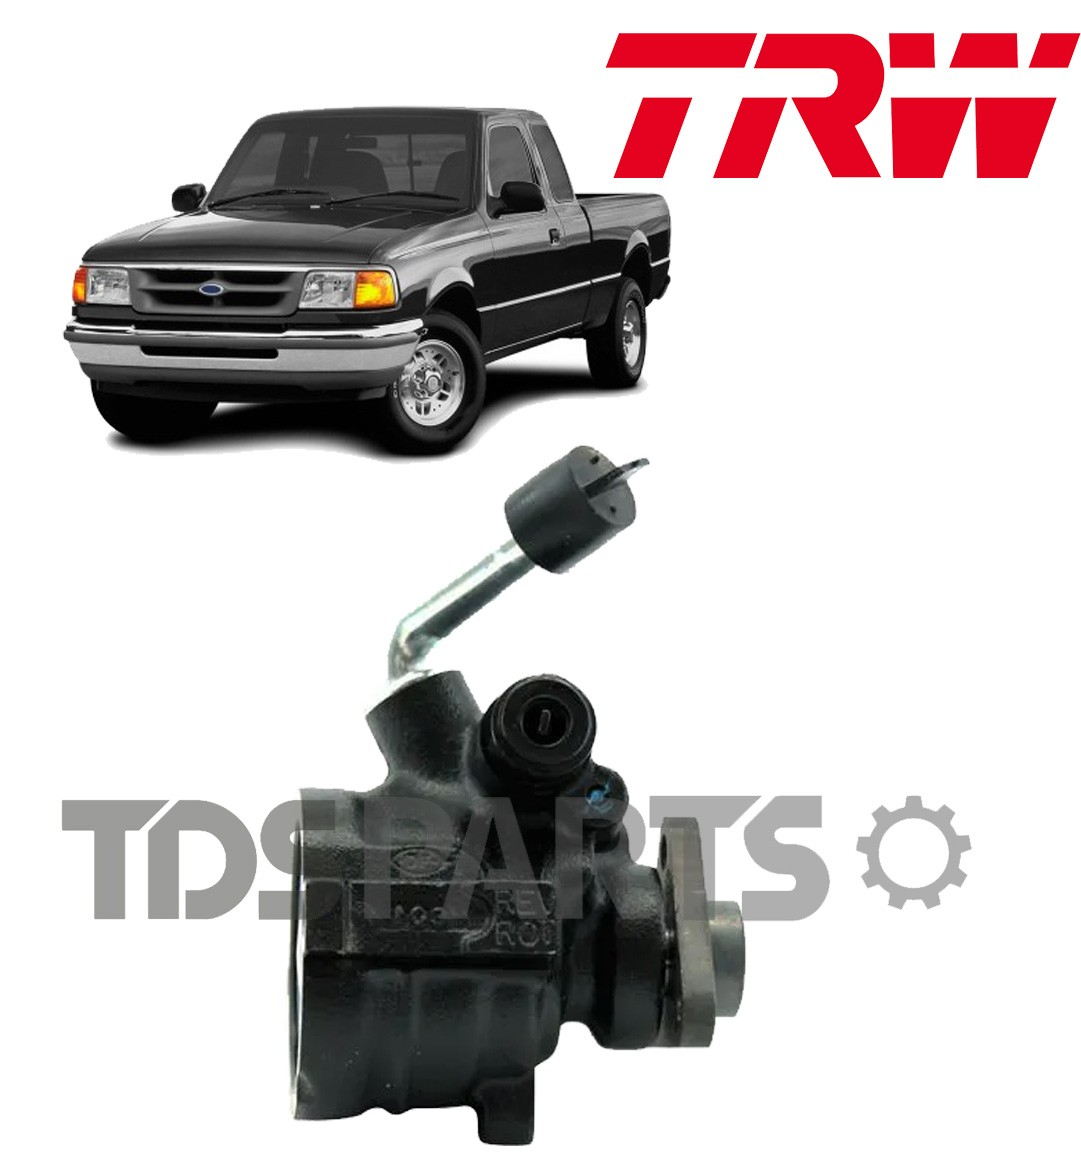 Bomba De Direção Hidráulica TRW Ford Ranger 2.5 / 2.8